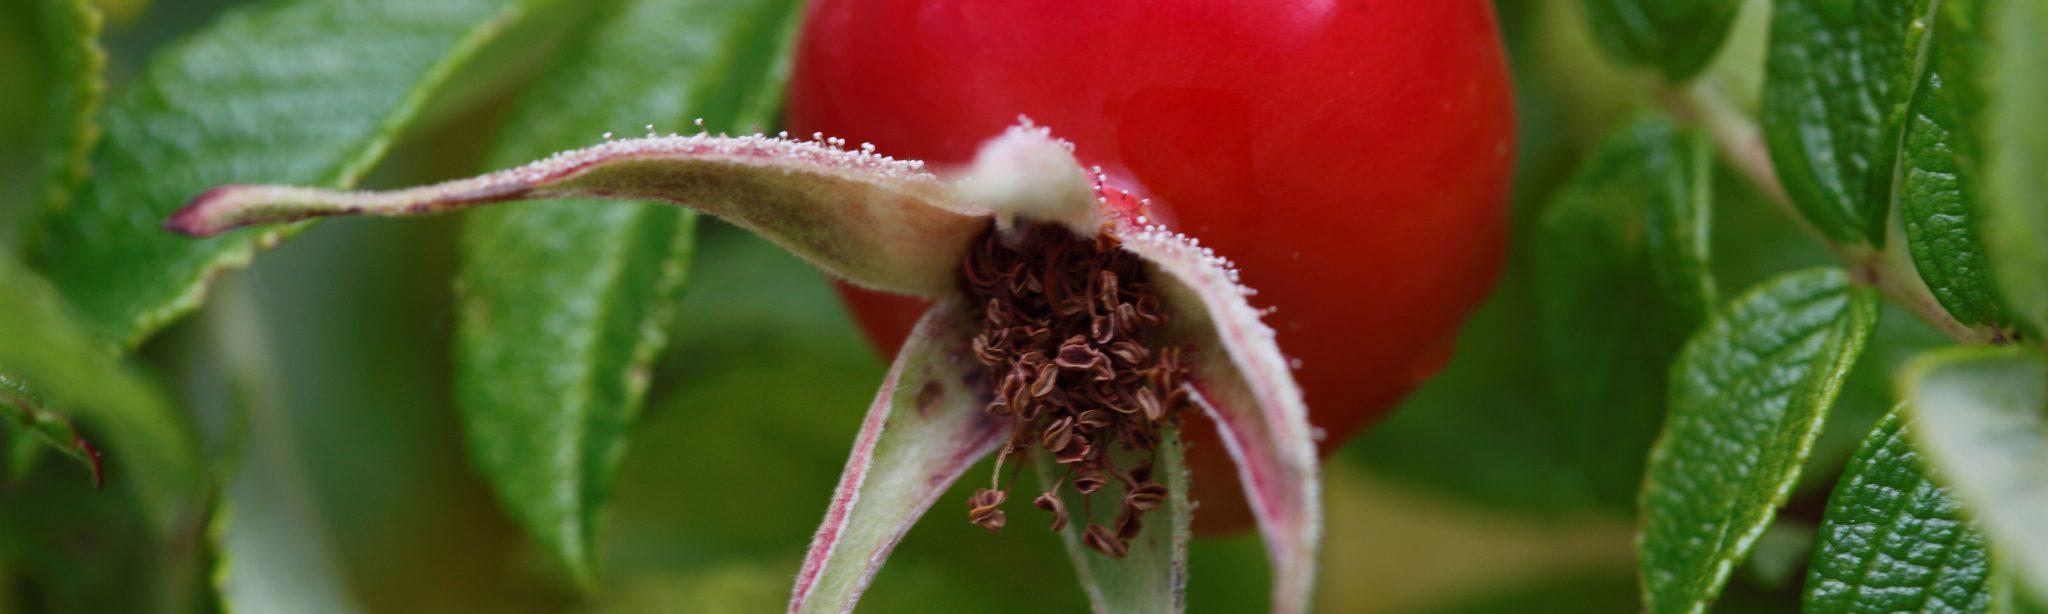 Rosehip-Seeds